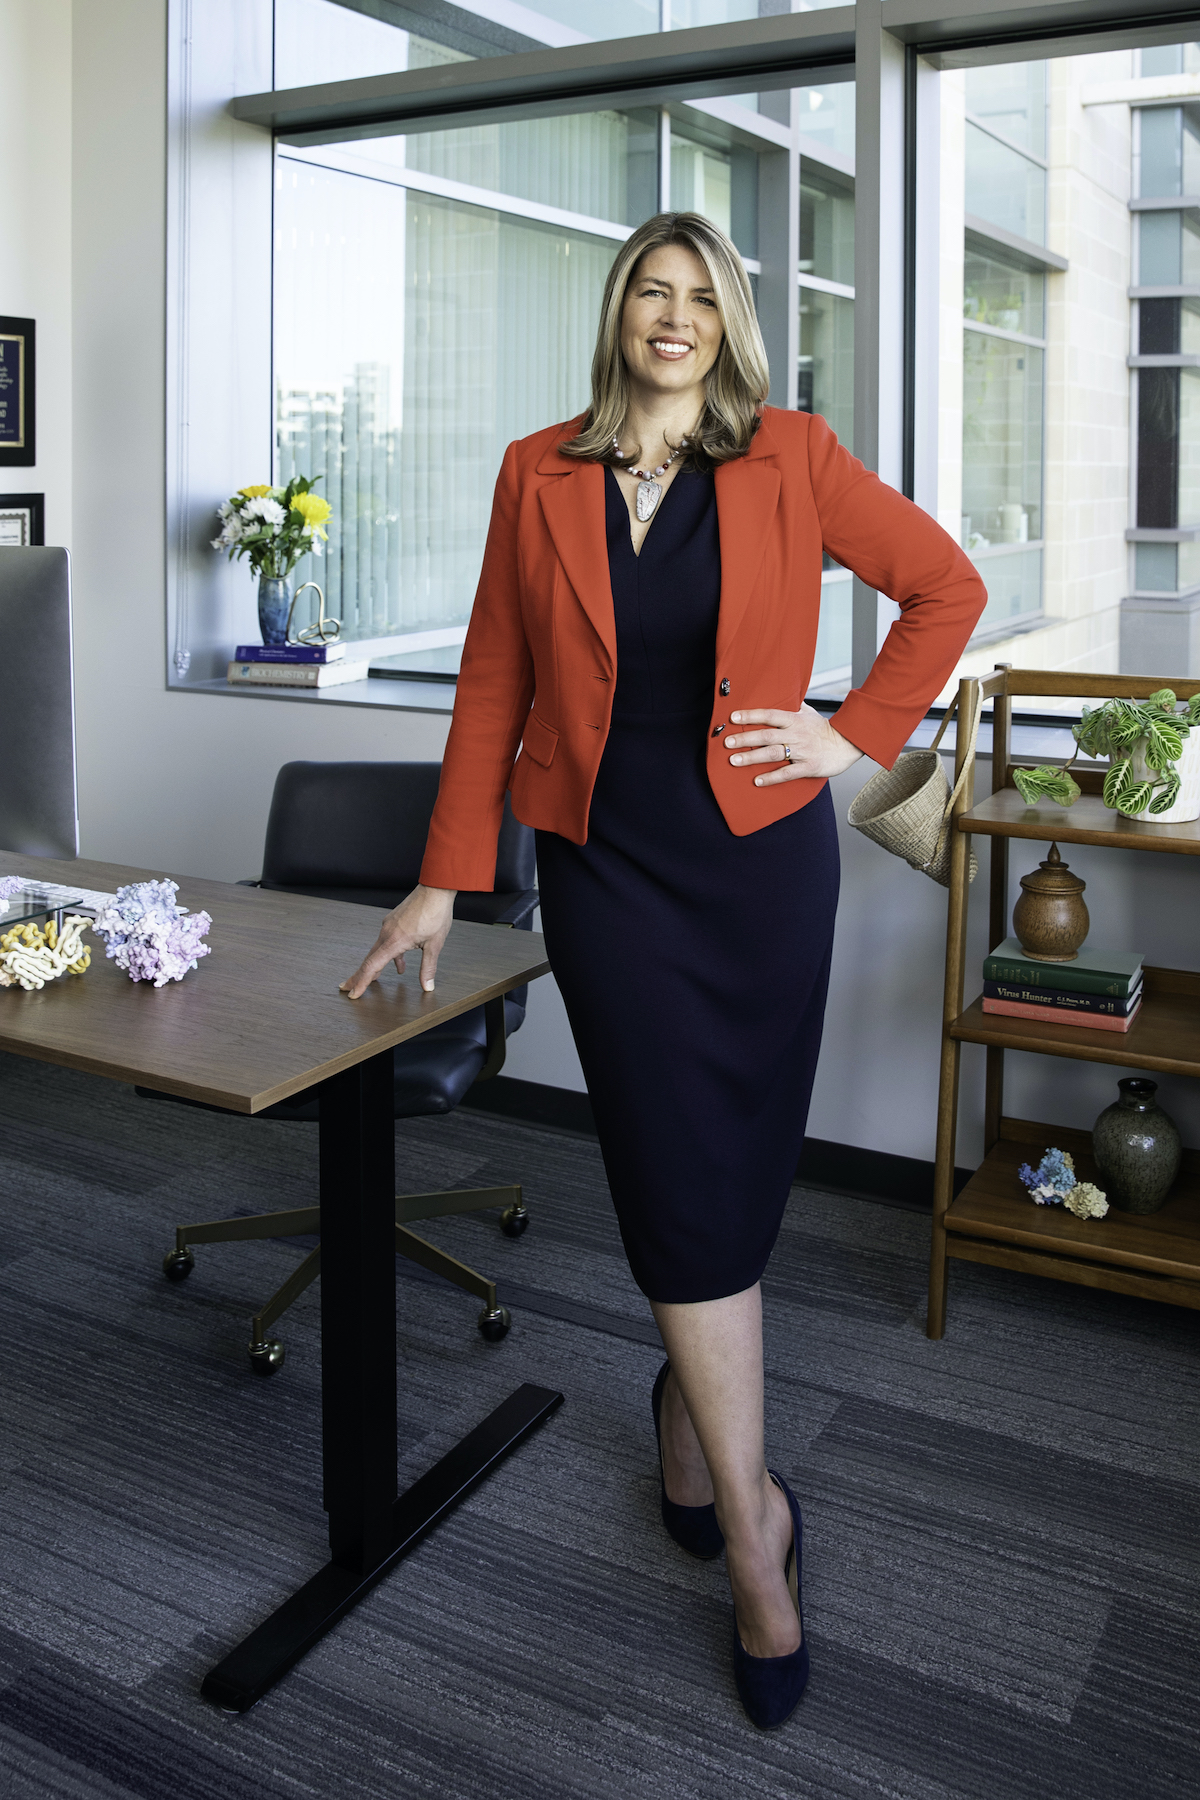 Dr. Erica Ollmann Saphire (Credit: Jenny Siegwart)